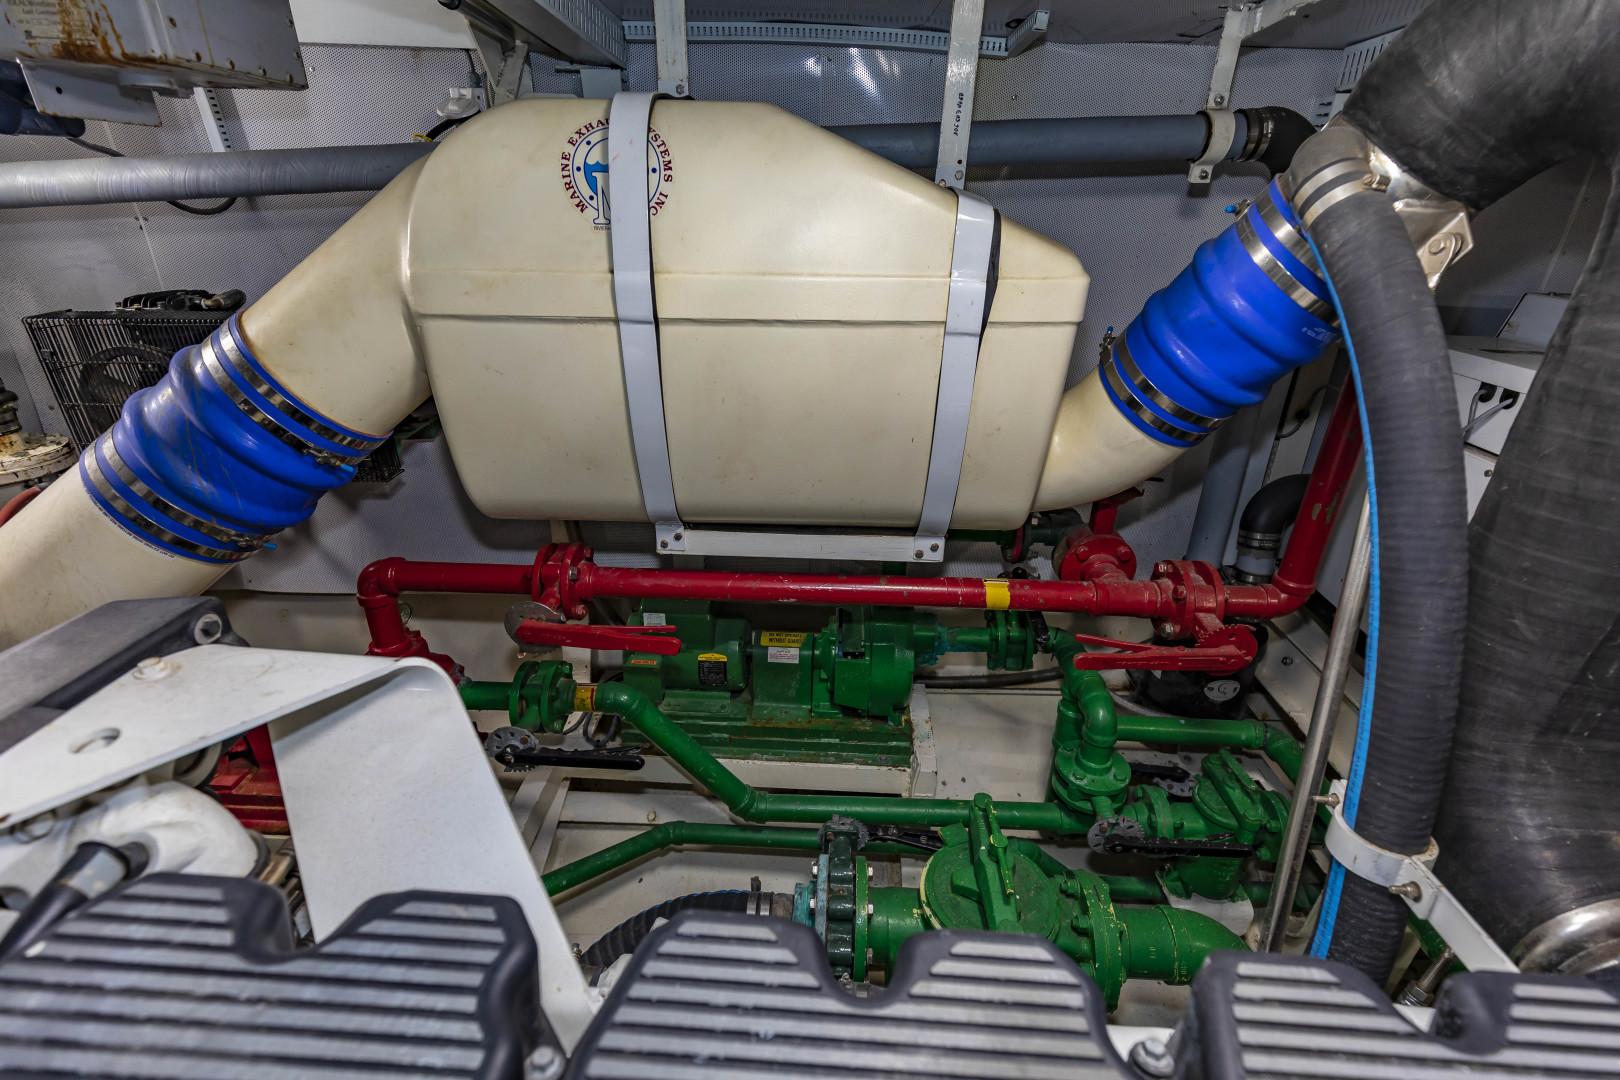 GlassTech-Expedition Yacht 2018-Reset Stuart-Florida-United States-Marine Exhaust Muffler-1570479 | Thumbnail